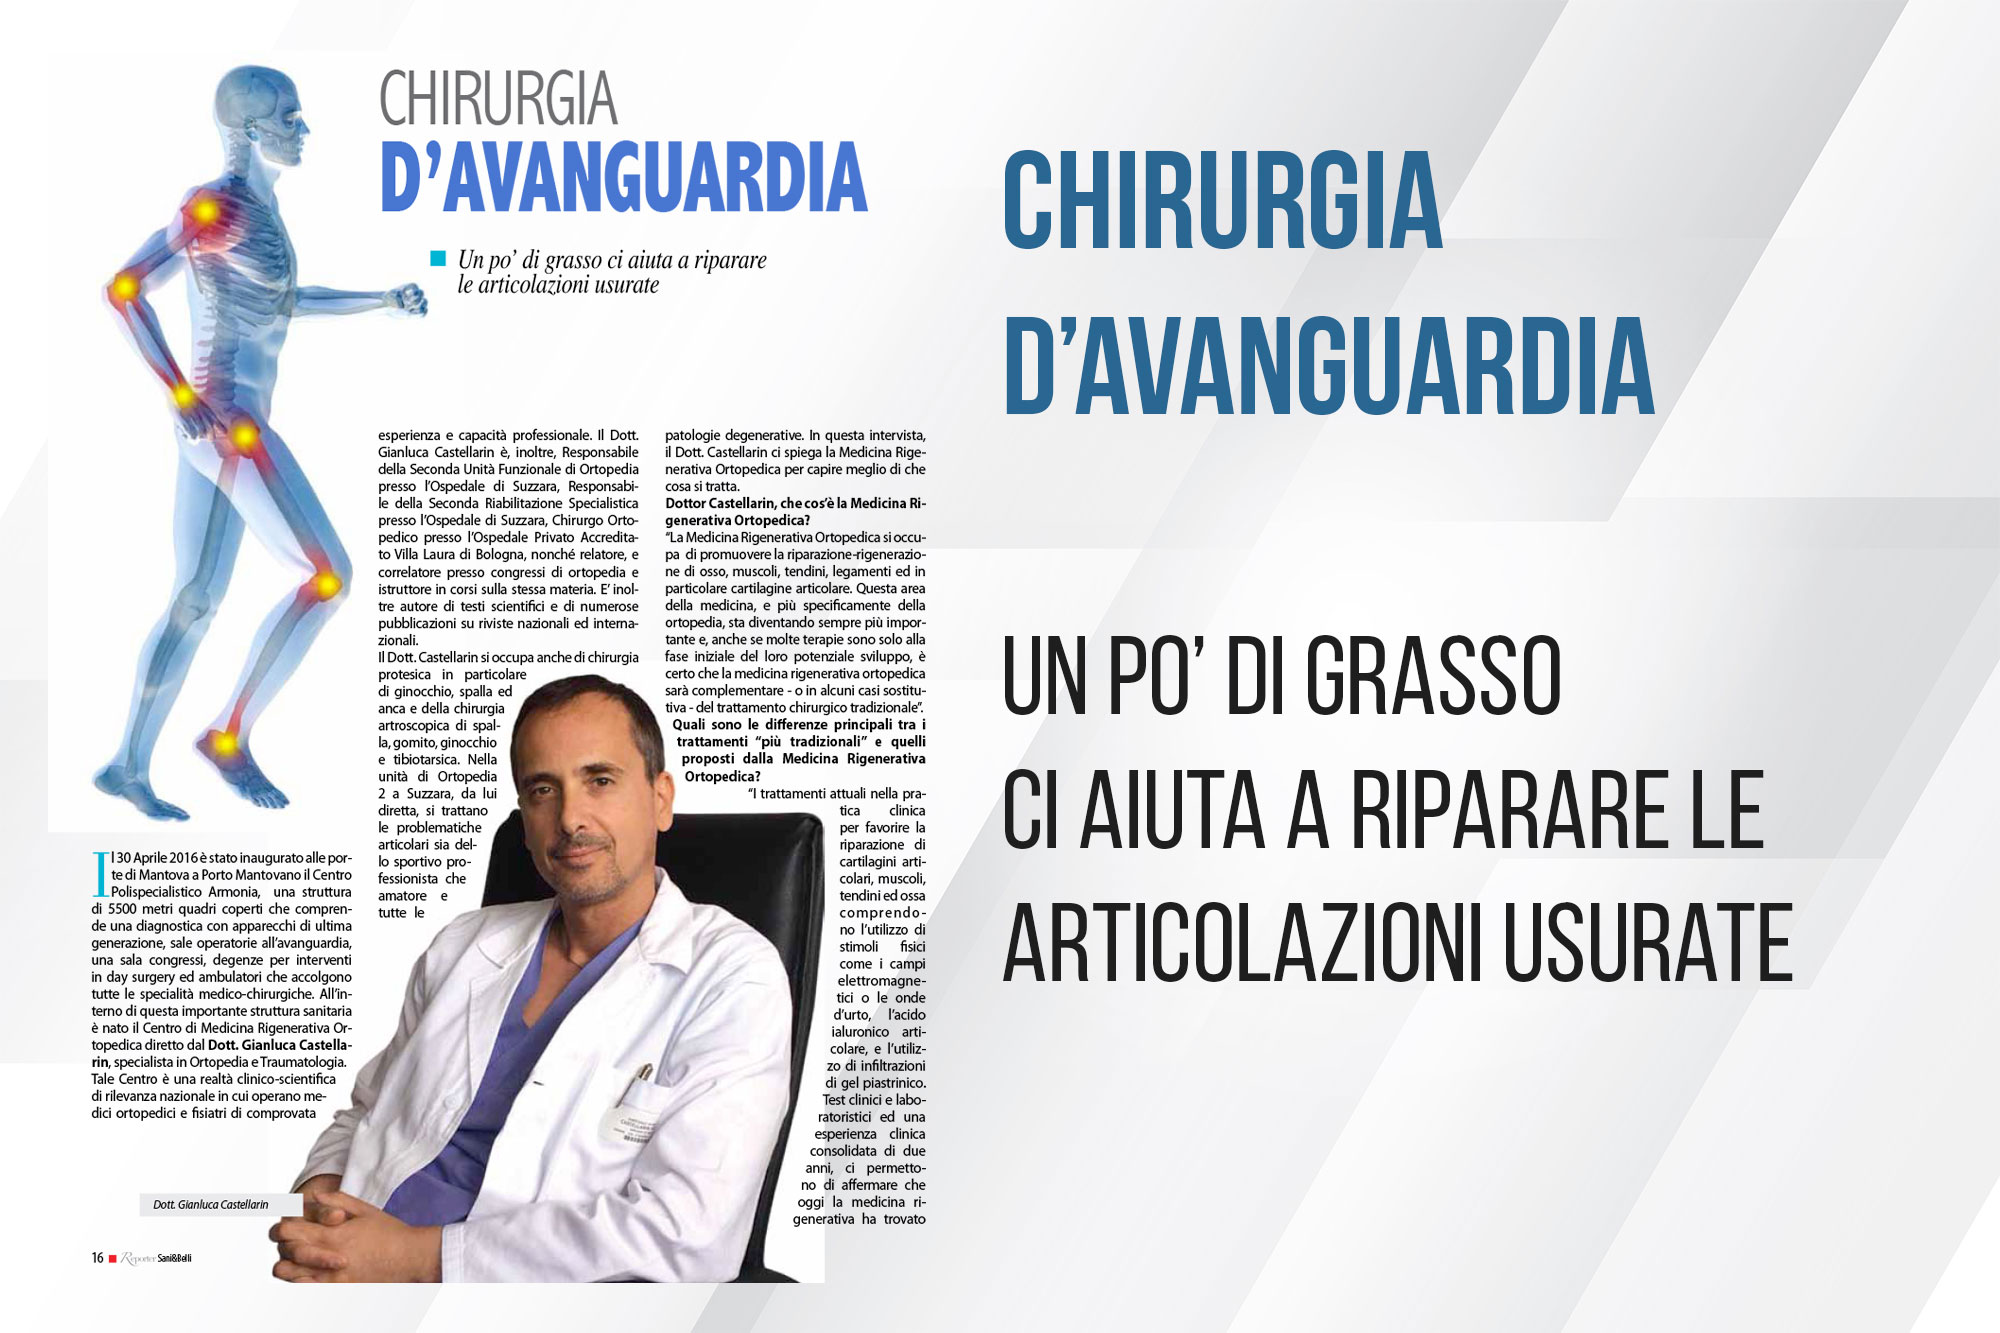 CHIRURGIA D'AVANGUARDIA